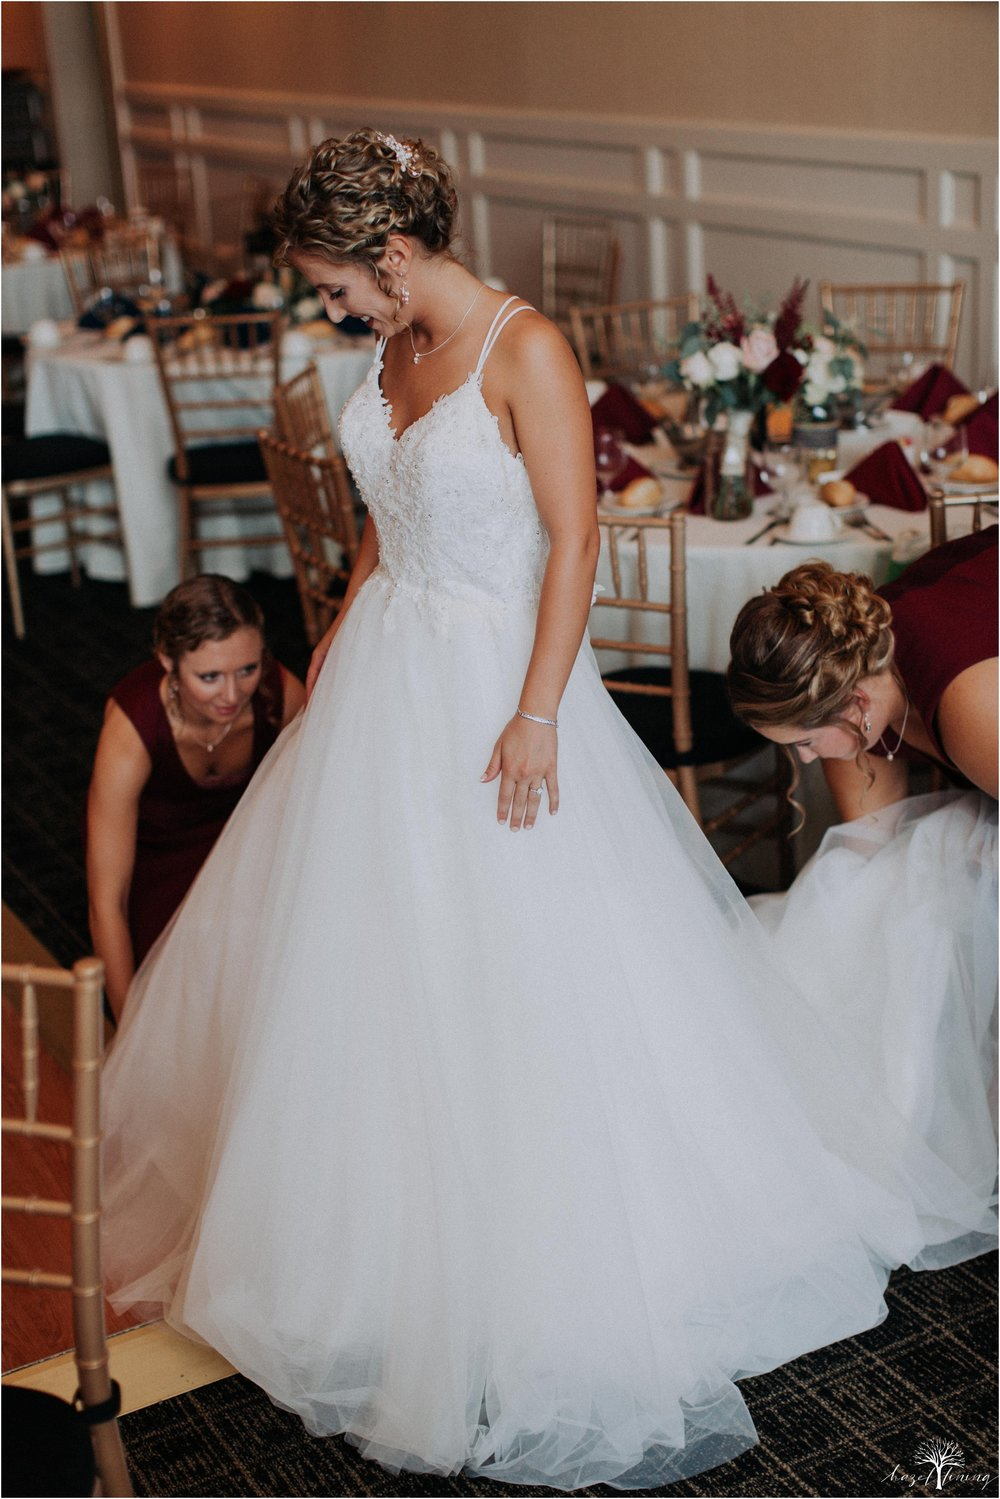 jonathan-weibel-becky-haywood-loft-at-sweetwater-cc-pennsburg-pennsylvania-rainy-day-summer-wedding-hazel-lining-travel-wedding-elopement-photography_0015.jpg